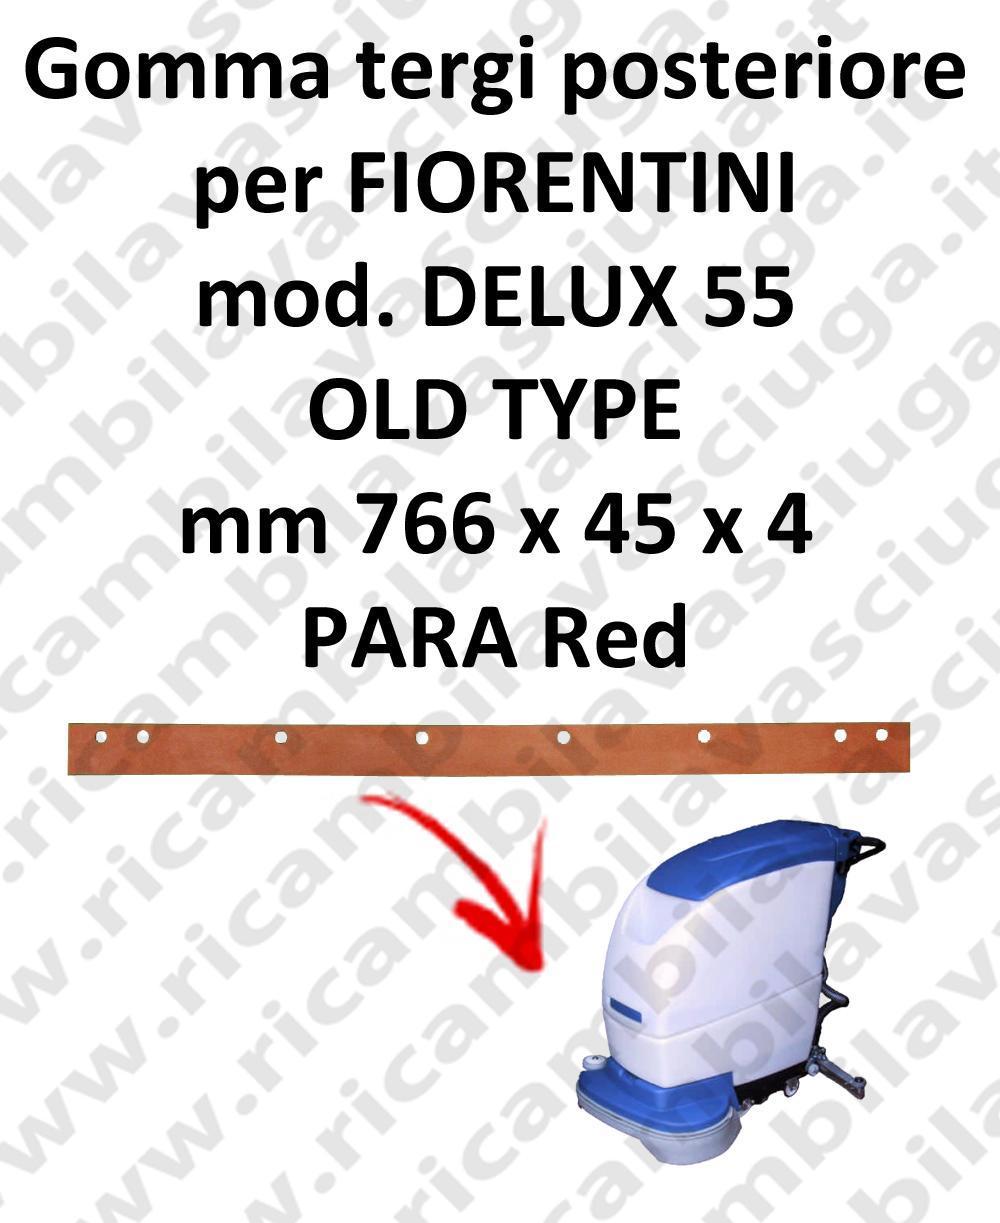 DELUX 55 old type BAVETTE ARRIERE pour autolaveuses FIORENTINI